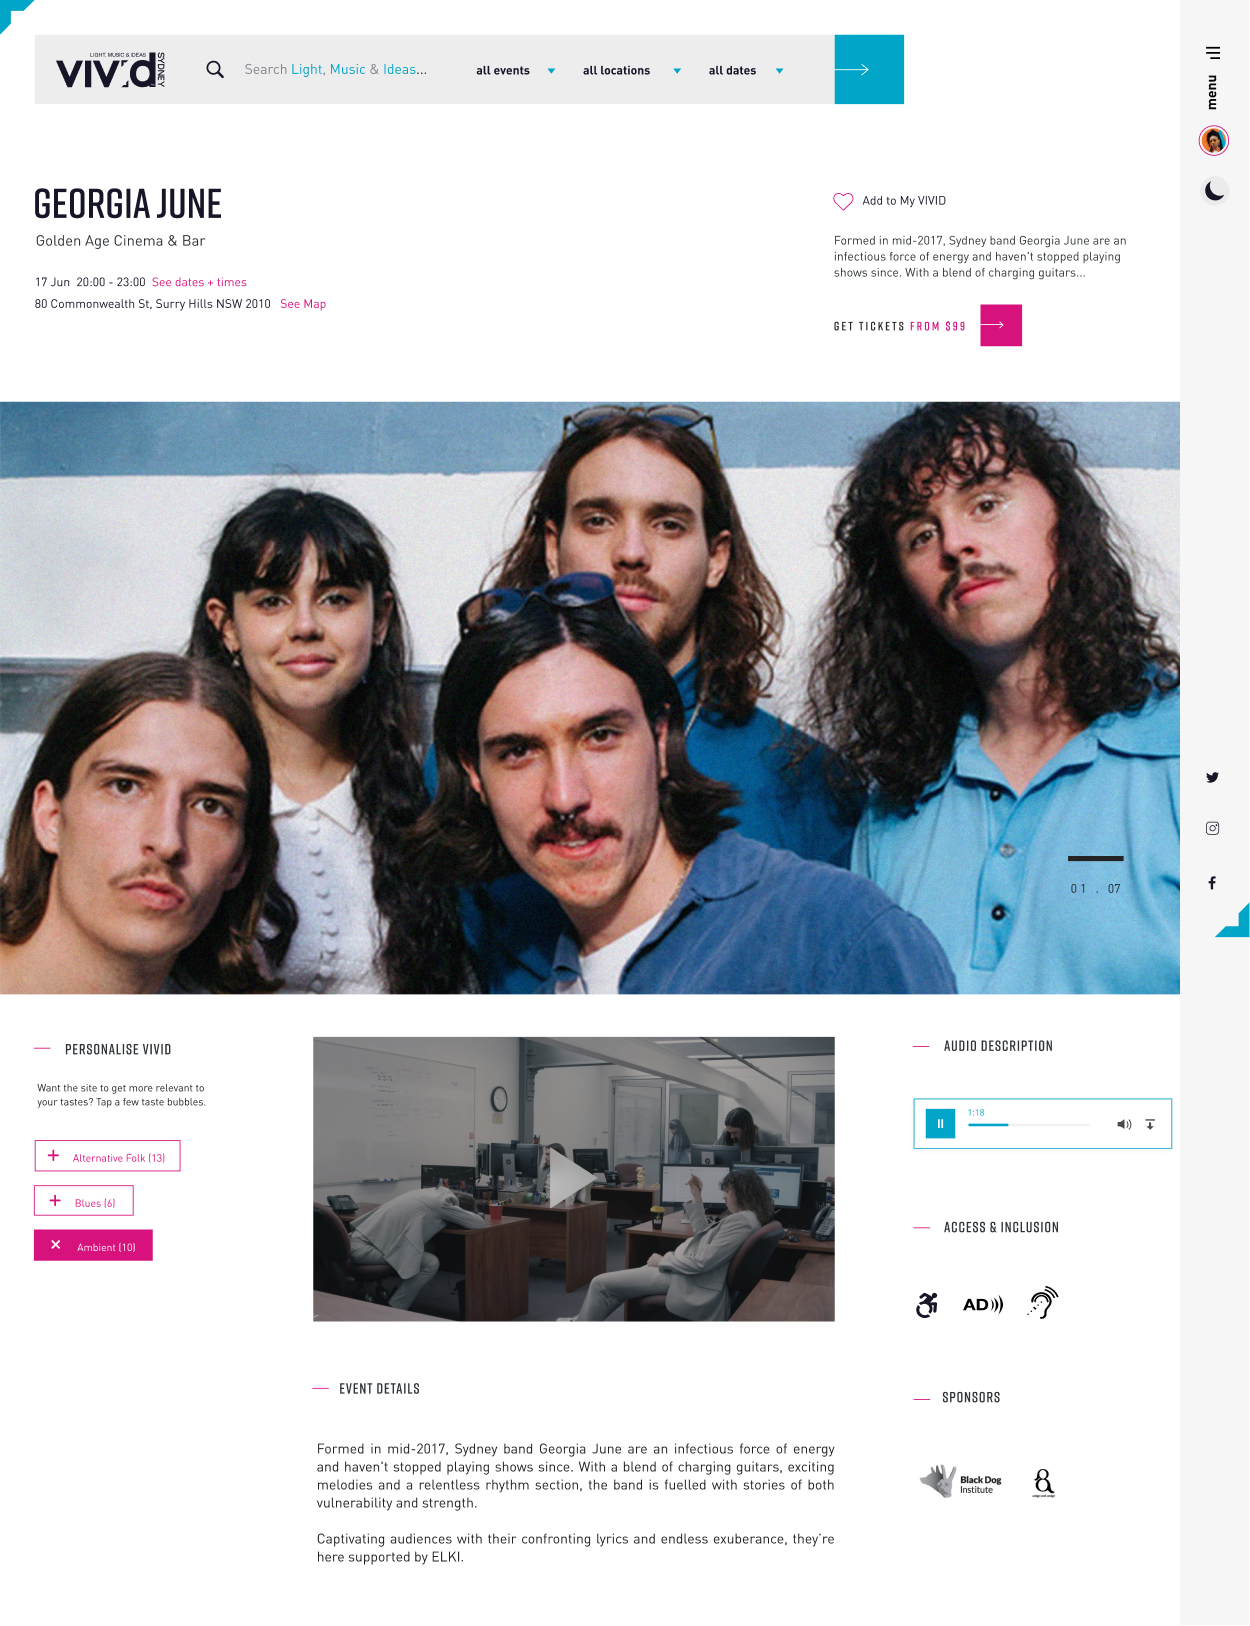 Vivid Sydney website desktop screen showcasing an event page